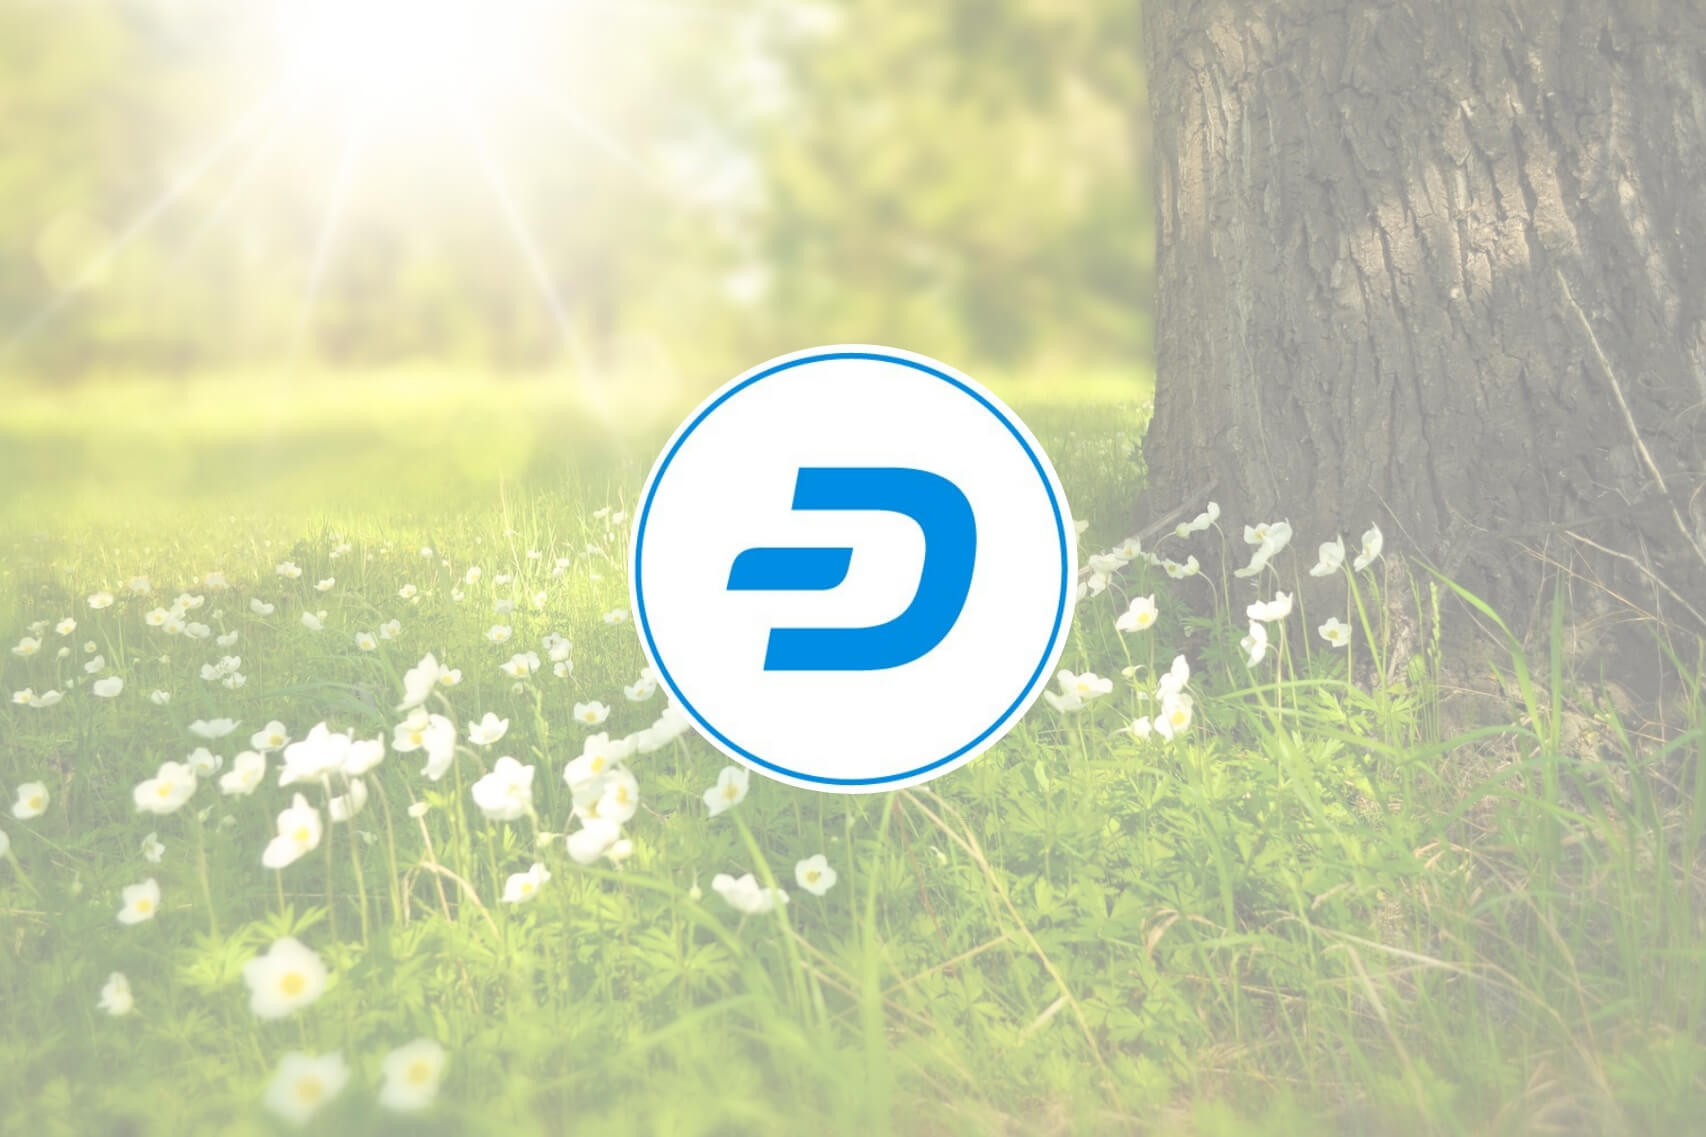 dash_affirms_sustainability